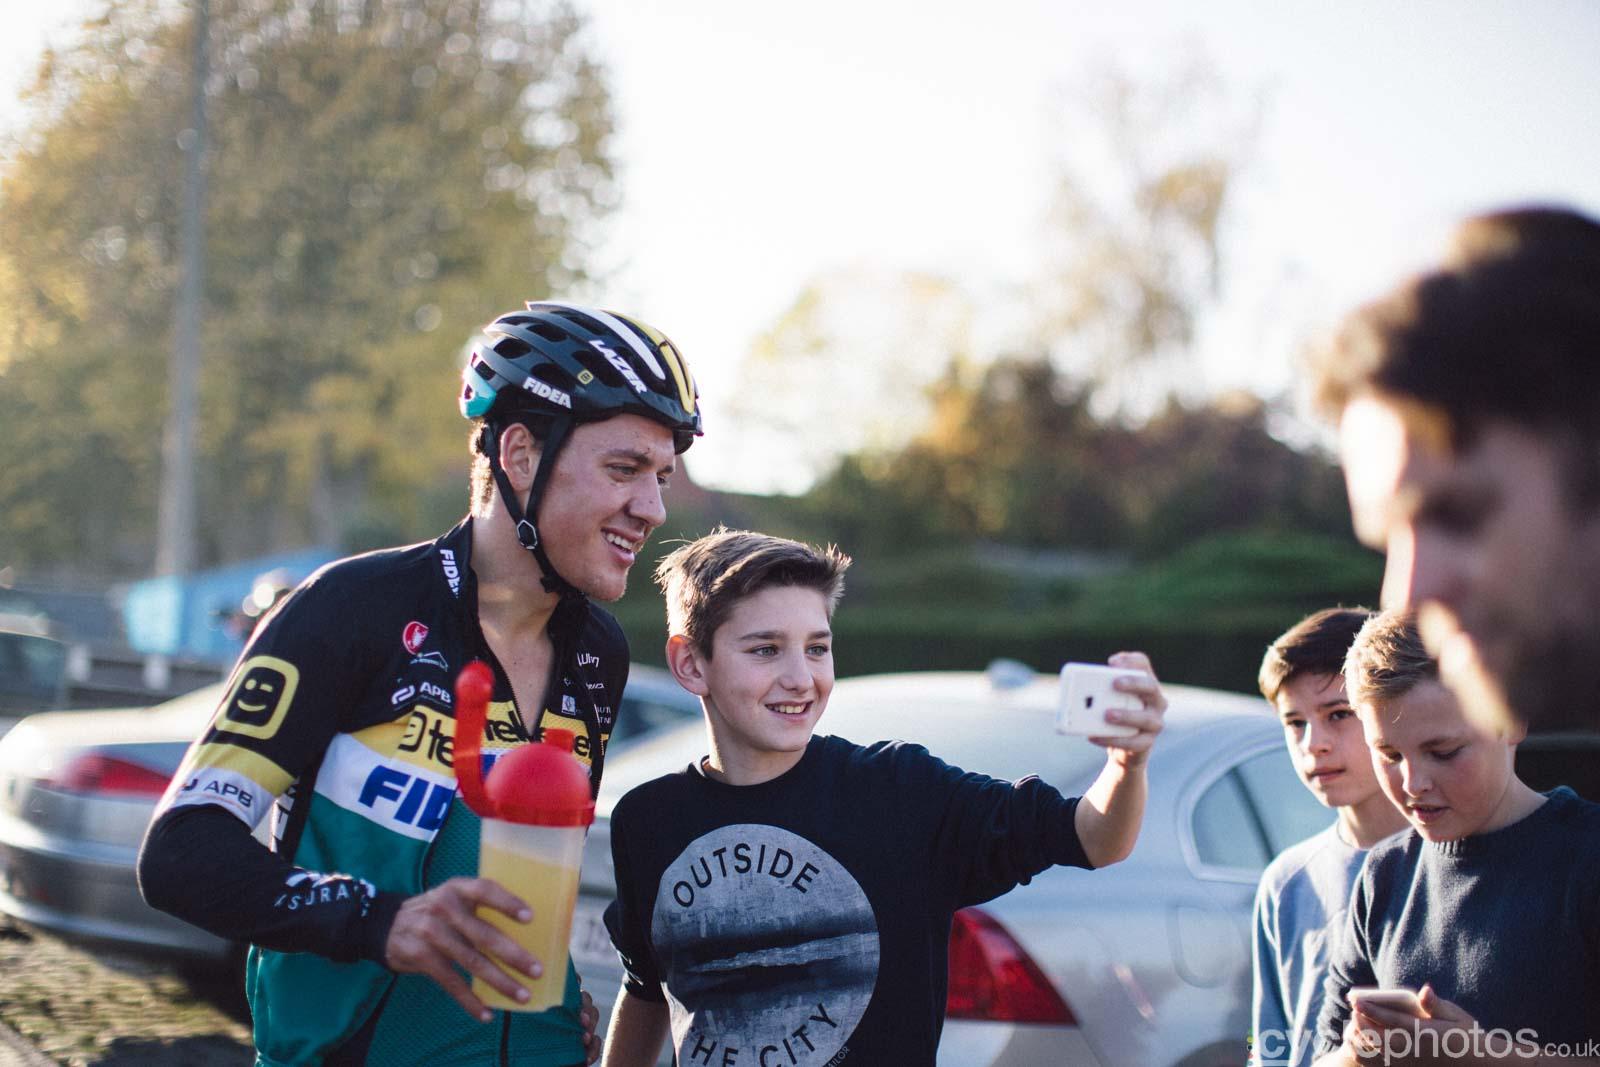 2015-cyclephotos-cyclocross-koppenberg-170253-tom-meeusen-selfie